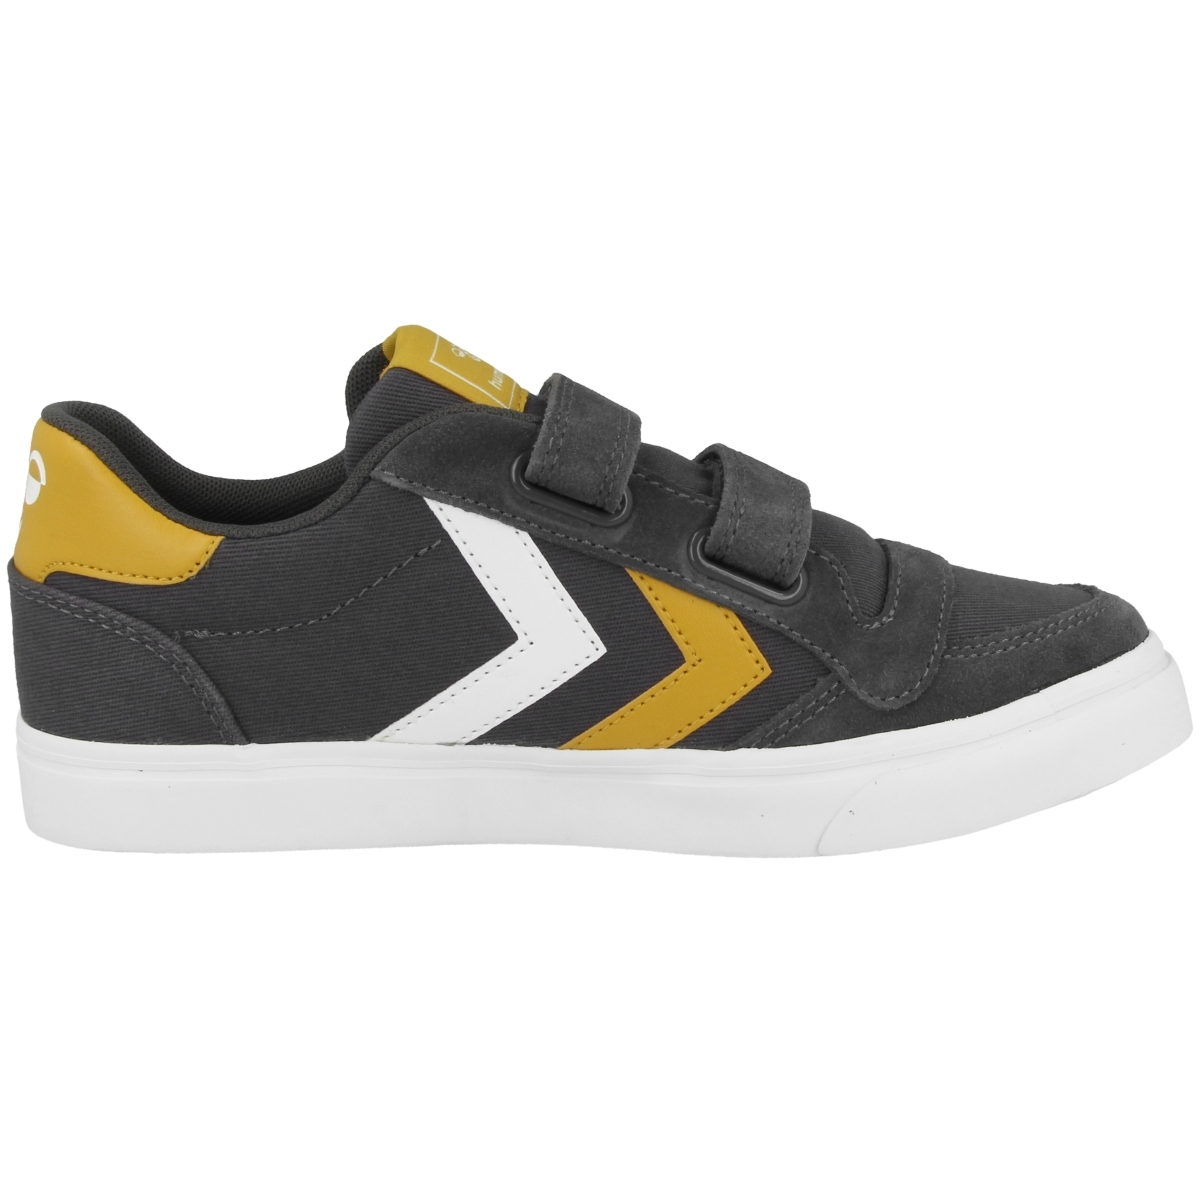 Hummel Stadil Low Cut Junior Sneaker Kinder Freizeit Schuhe Turnschuhe 205-756